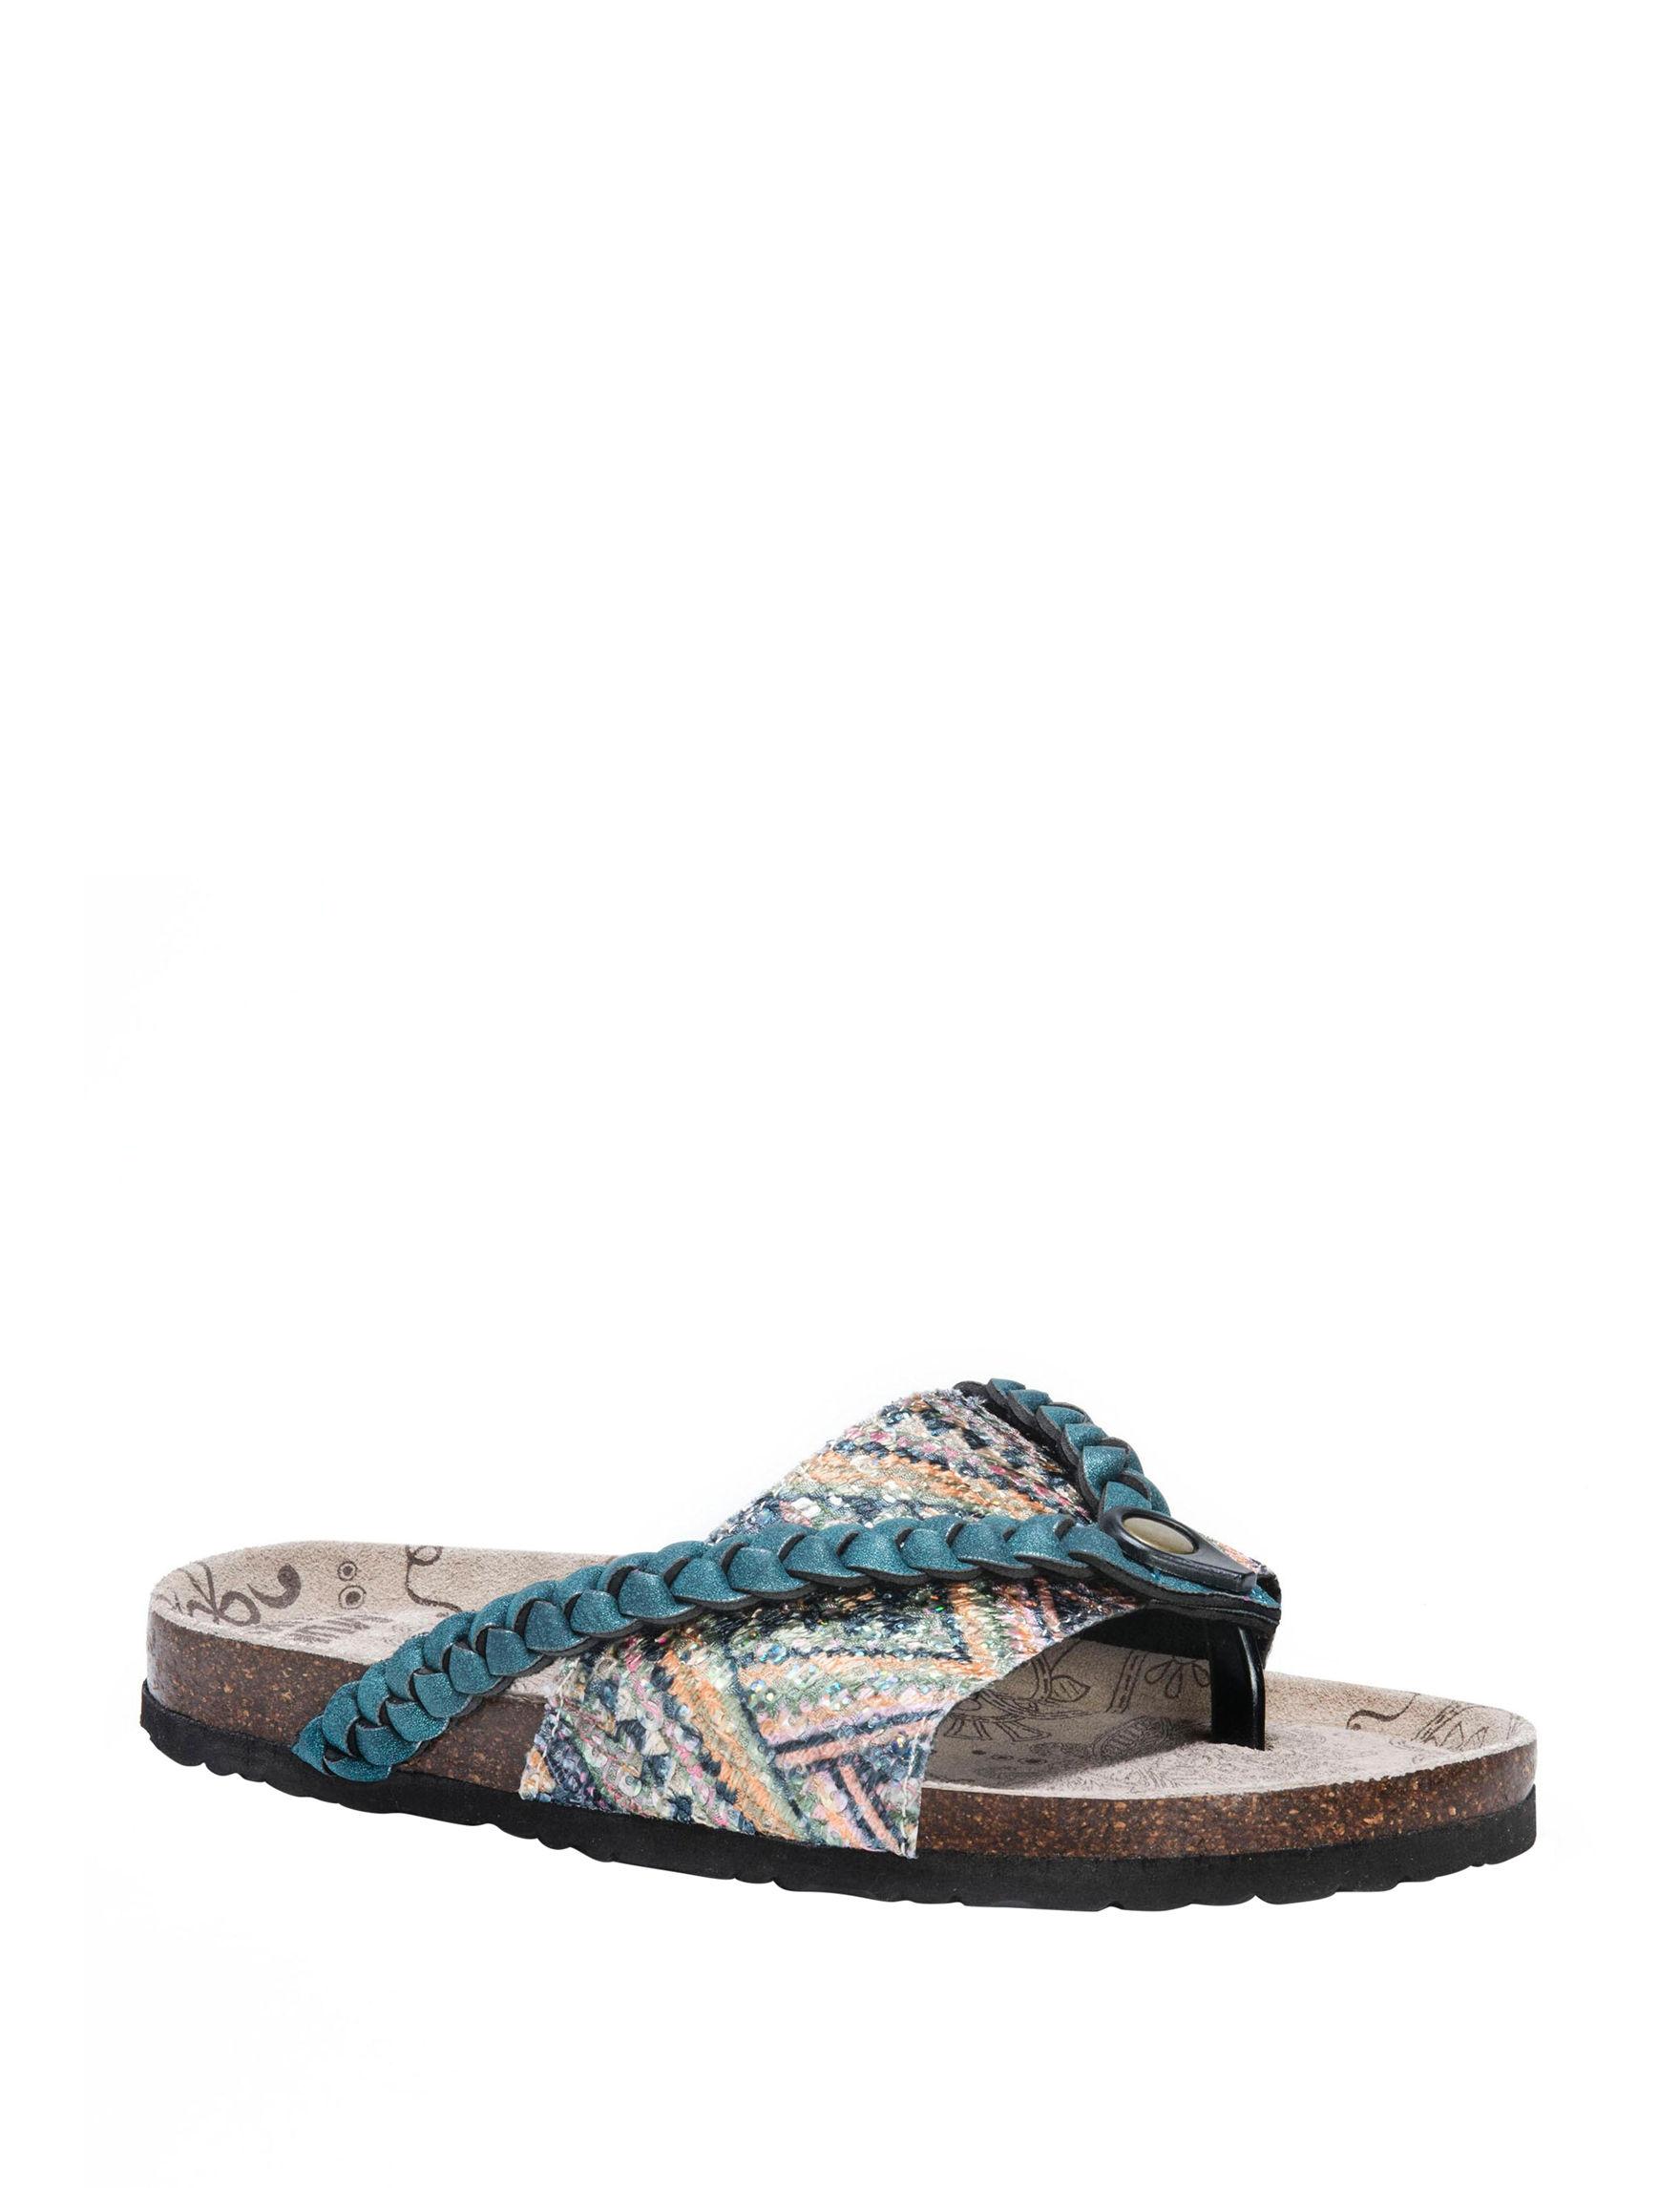 Muk Luks Teal Flat Sandals Flip Flops